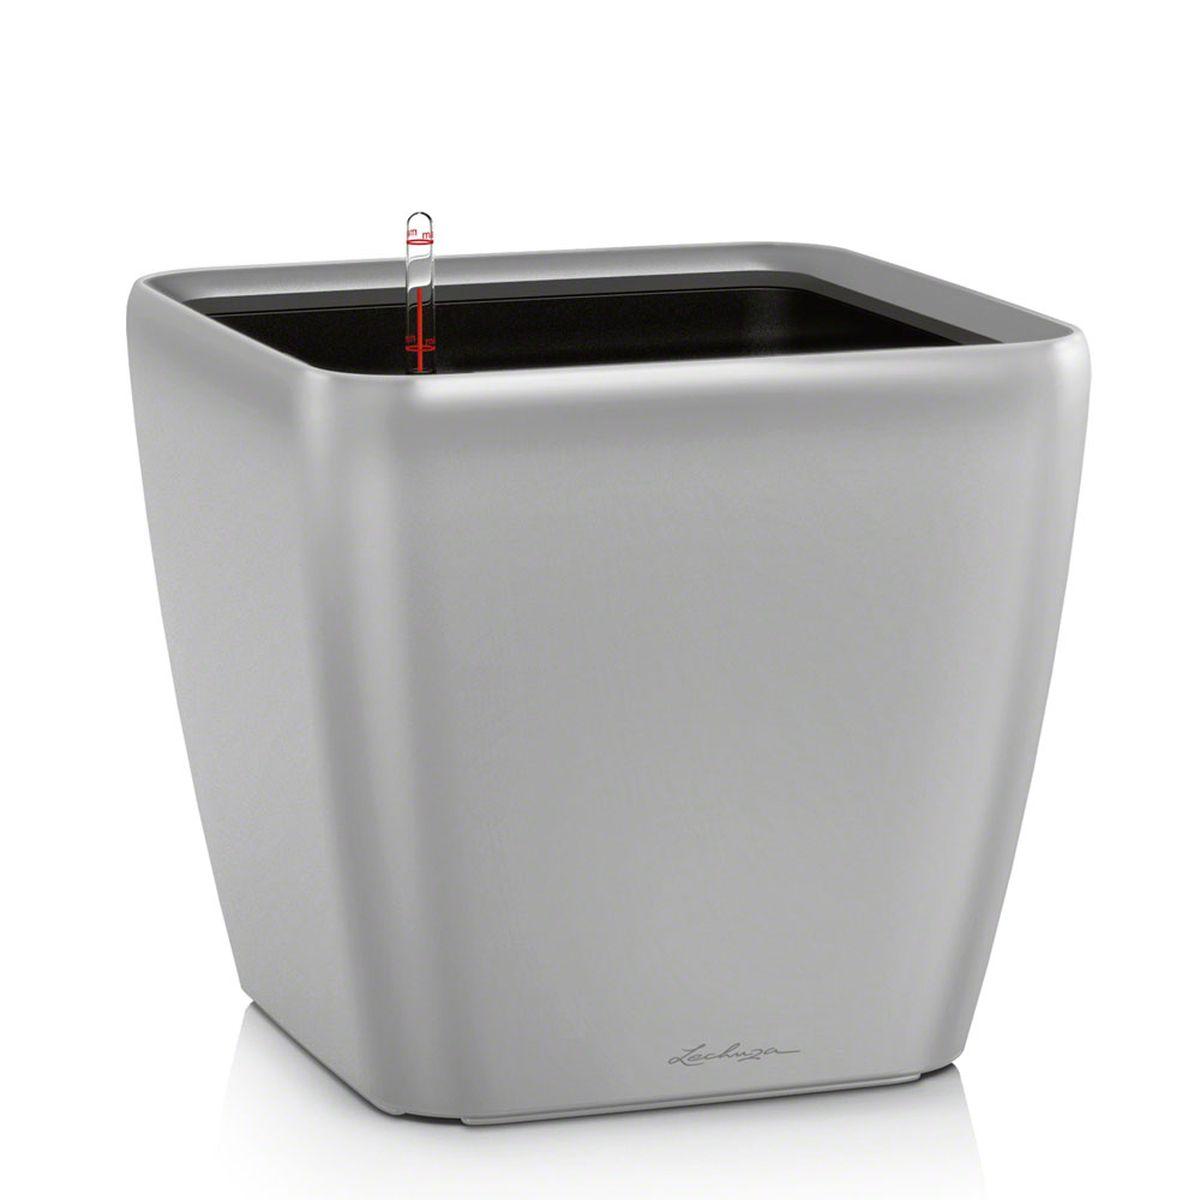 Кашпо Lechuza Quadro, с системой автополива, цвет: серебристый, 21 х 21 х 20 см quadro сумки